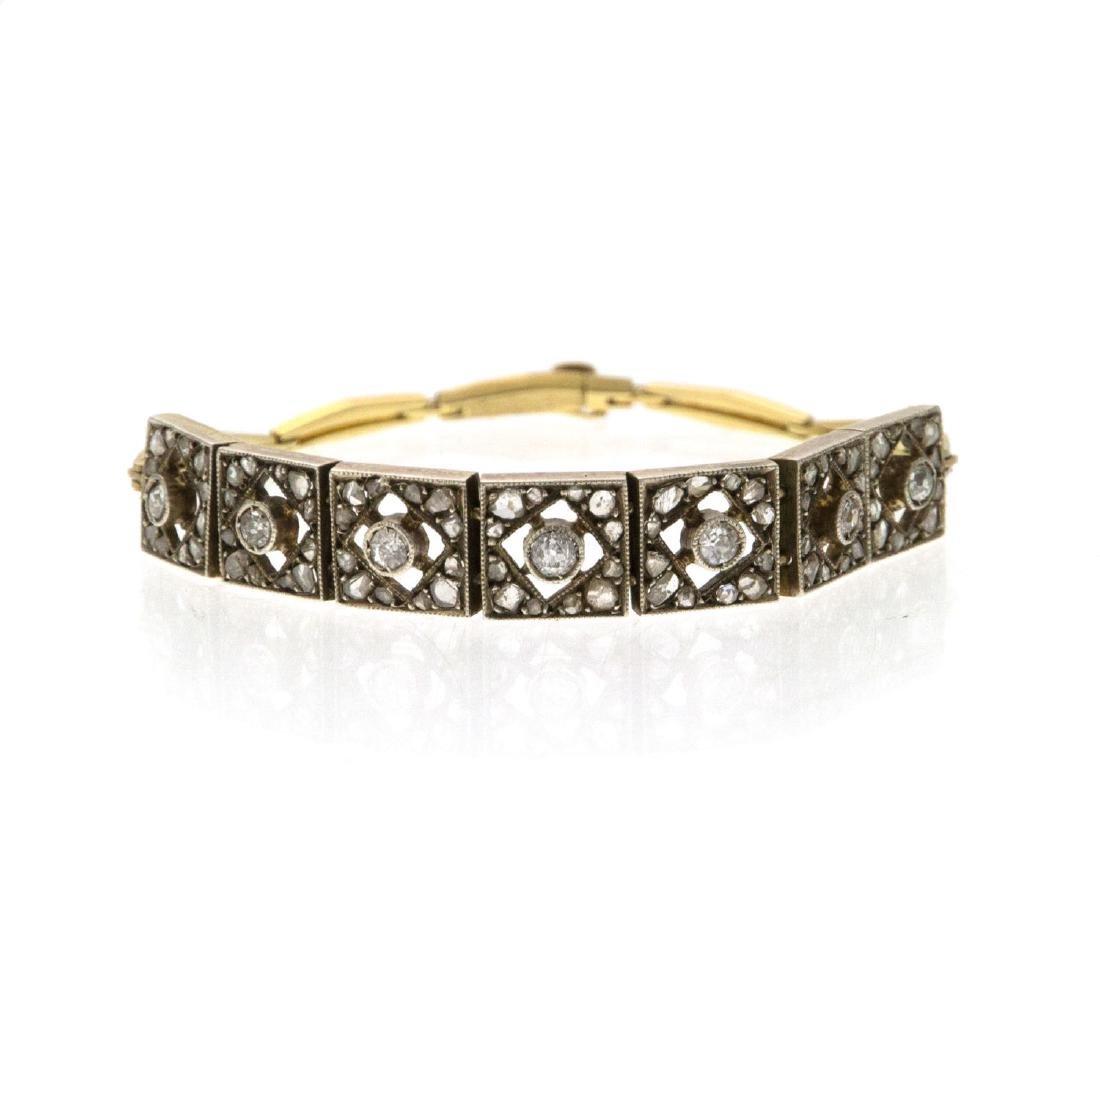 Antique 18k Gold Diamond Bracelet.